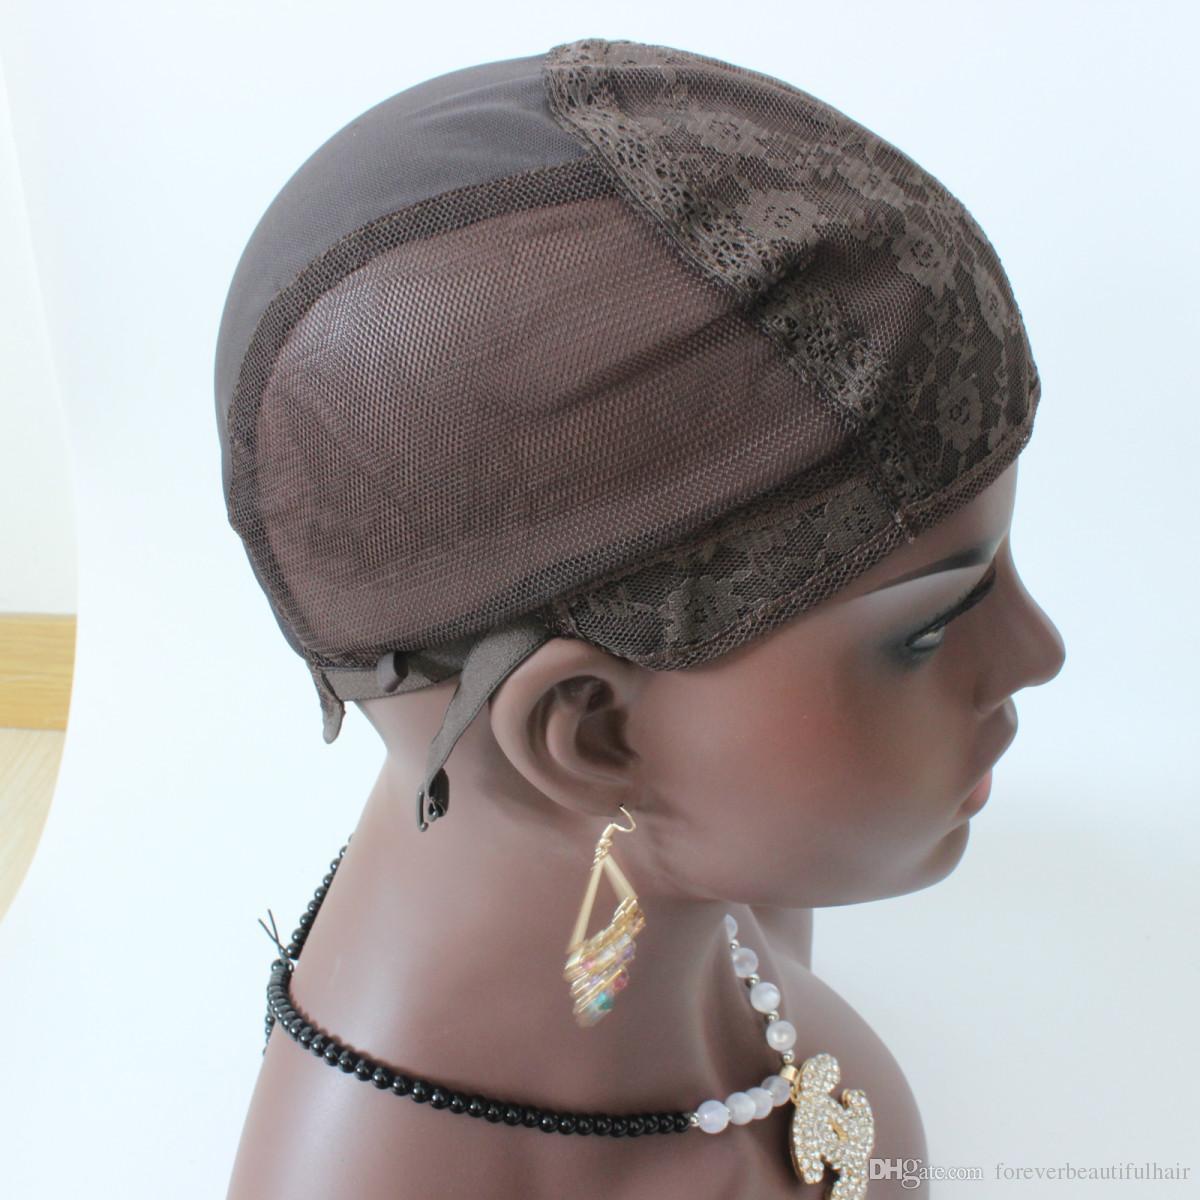 3 adet Yahudi peruk kap kahverengi renk S / M / L Tutkalsız Peruk Yapımı için Peruk Caps Streç Dantel Dokuma Kap Ayarlanabilir Sapanlar Orta Kahverengi